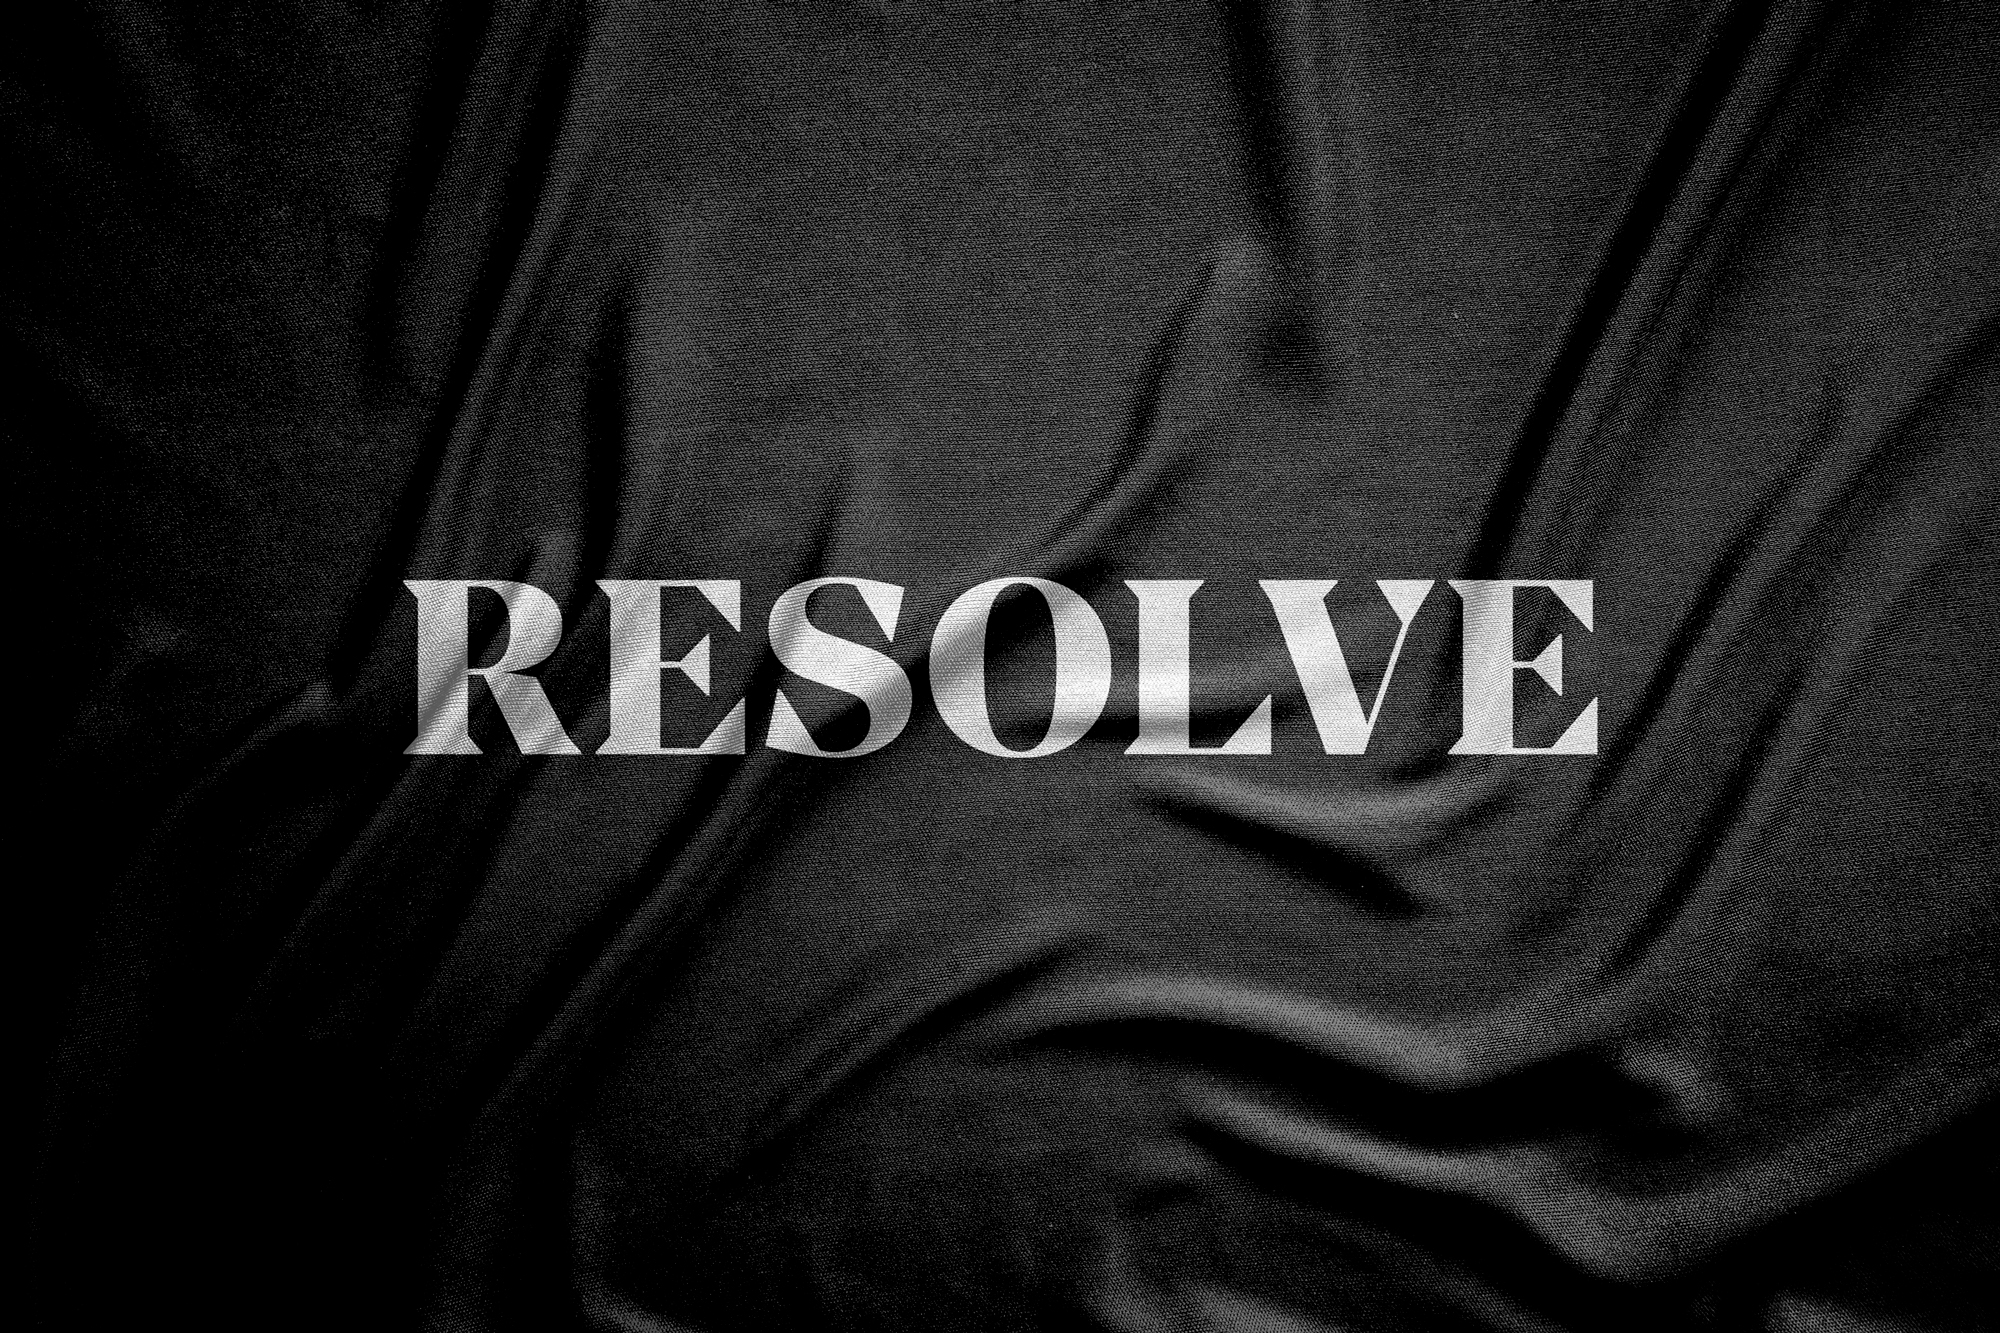 Resolve Clothing logo printed onto fabric